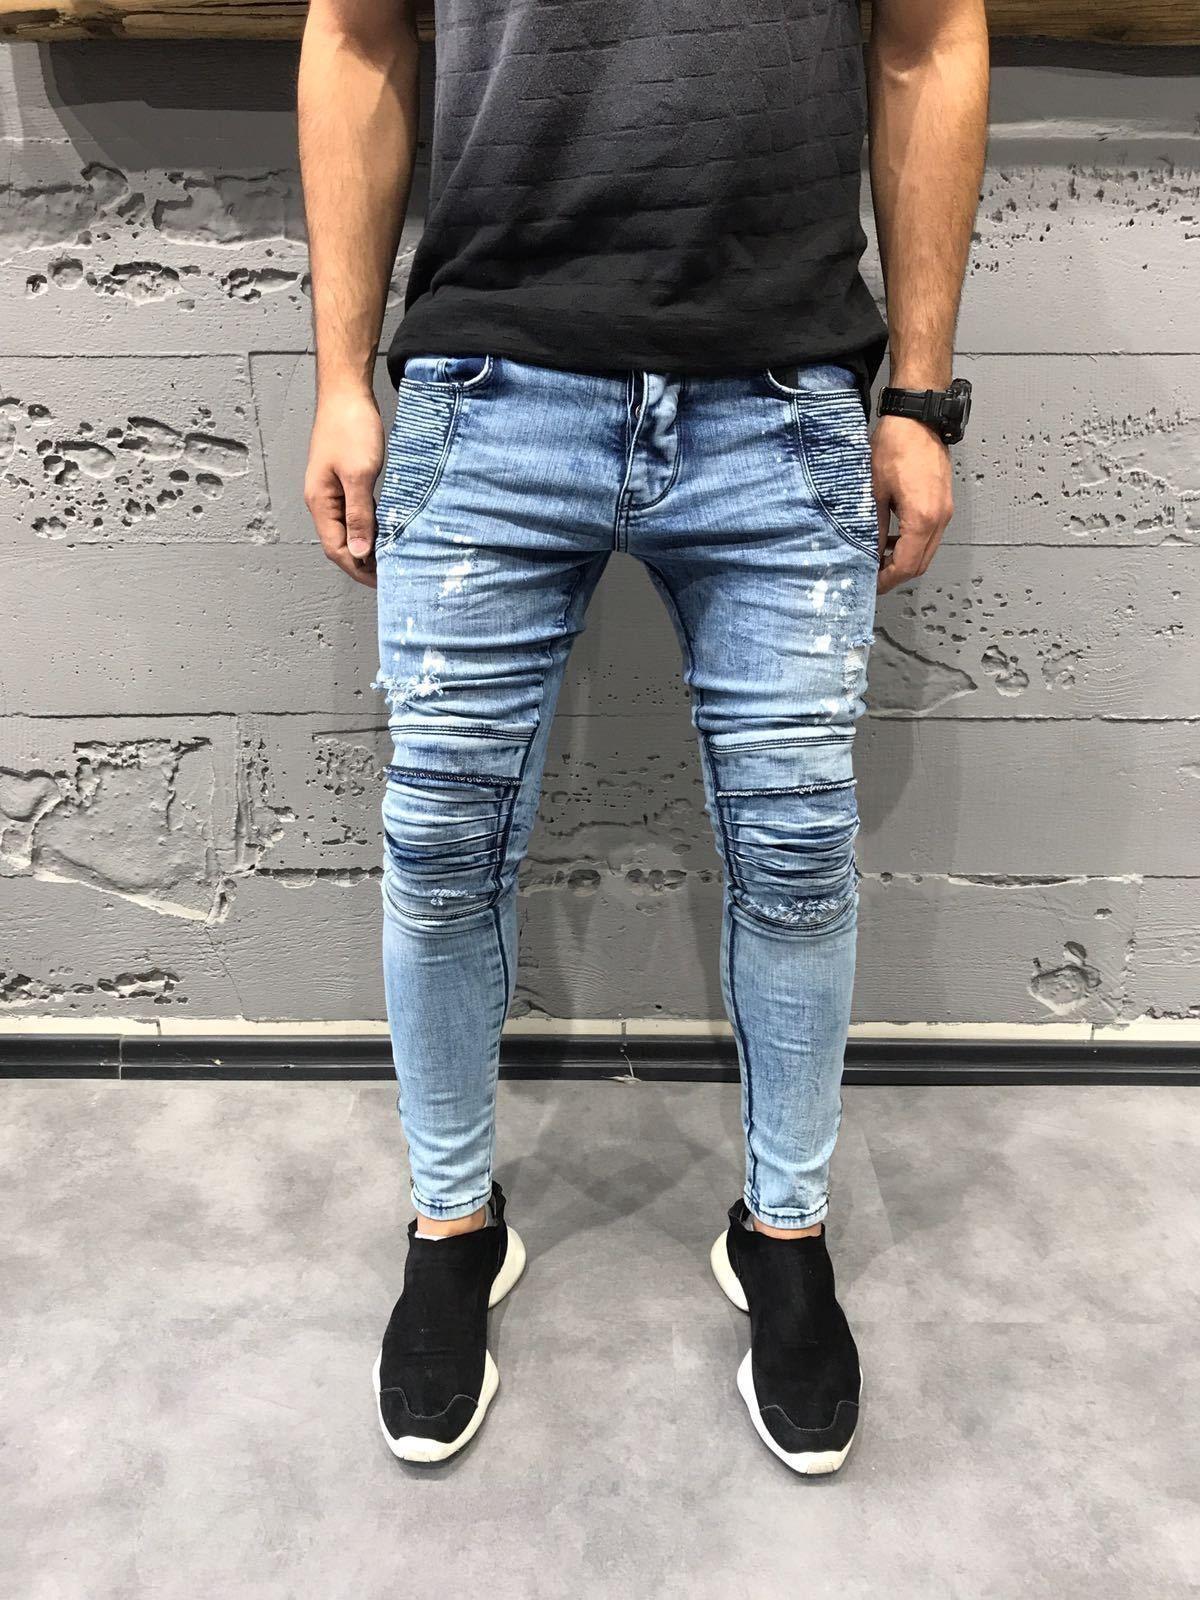 Mens Jeans Slim Skinny Pants Knee Rips Wash Blue Denim Express Shipping 3375 Mens Jeans Slim Mens Jeans Ripped Jeans Men